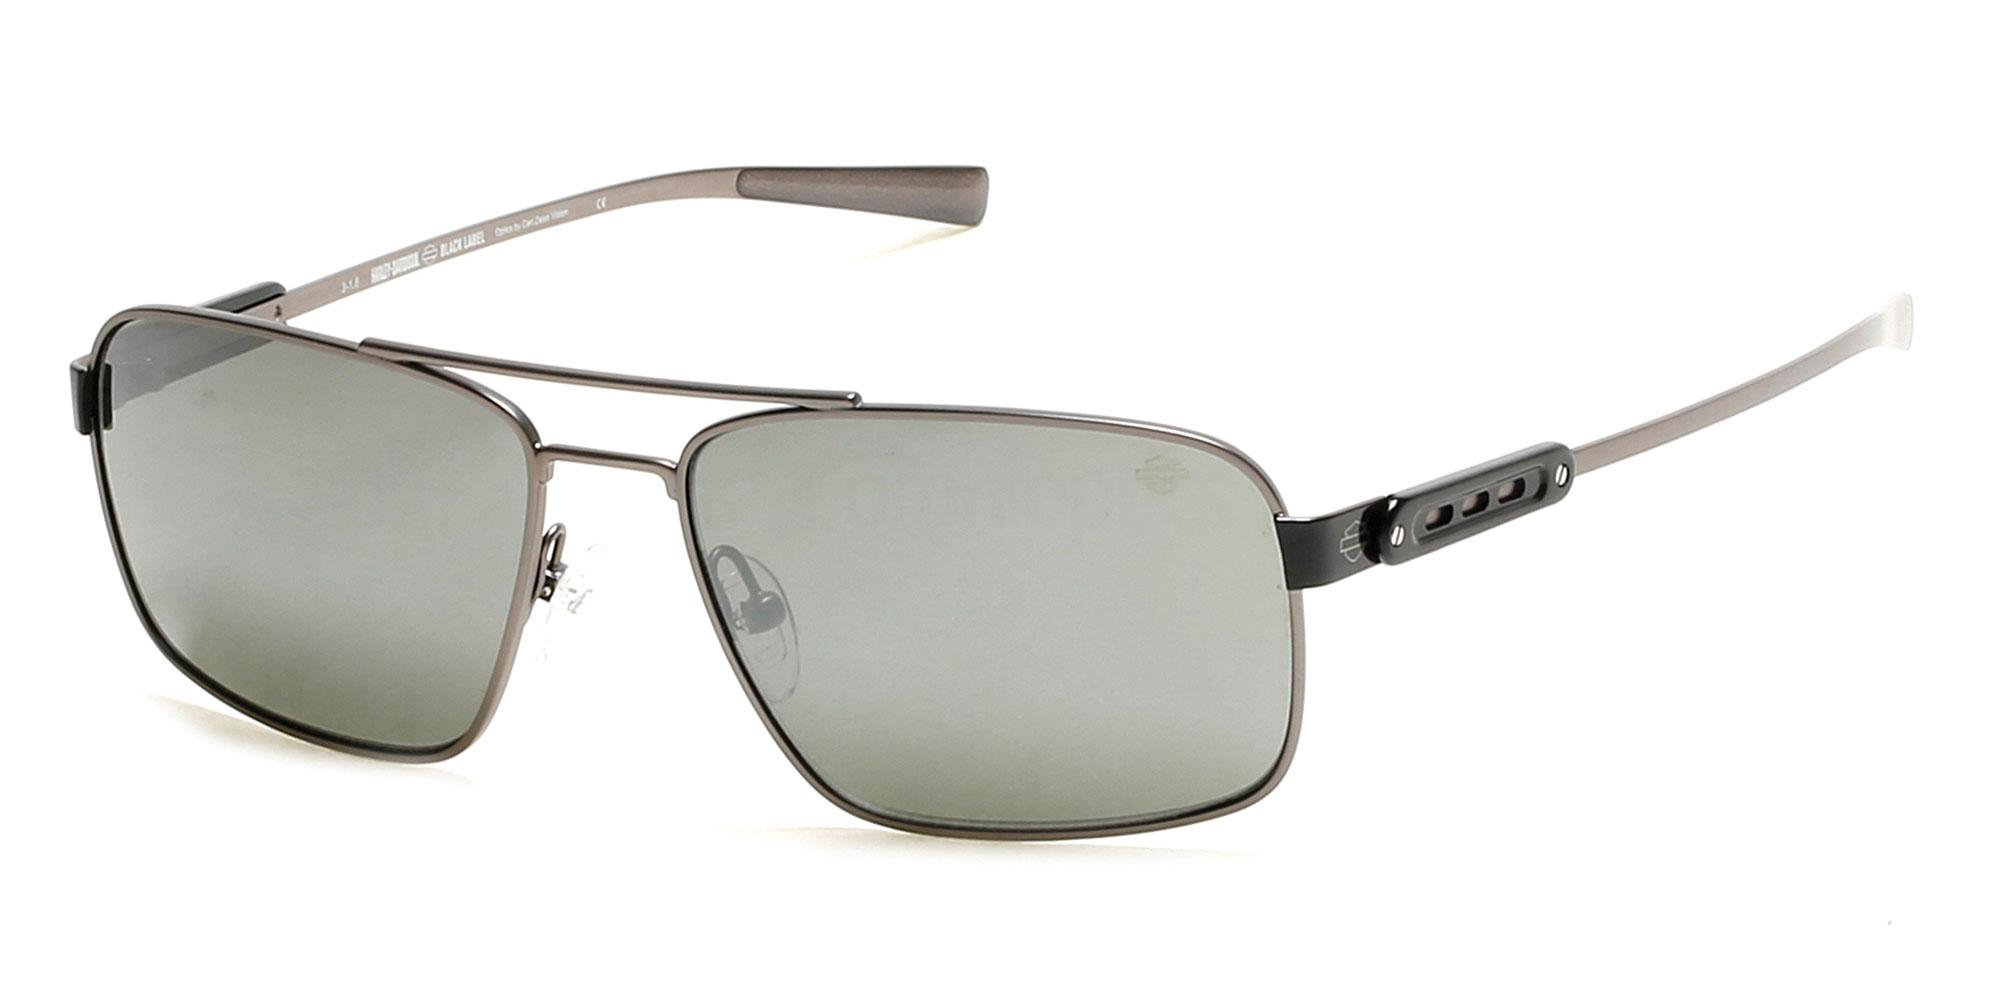 09C HD2047 Sunglasses, Harley Davidson